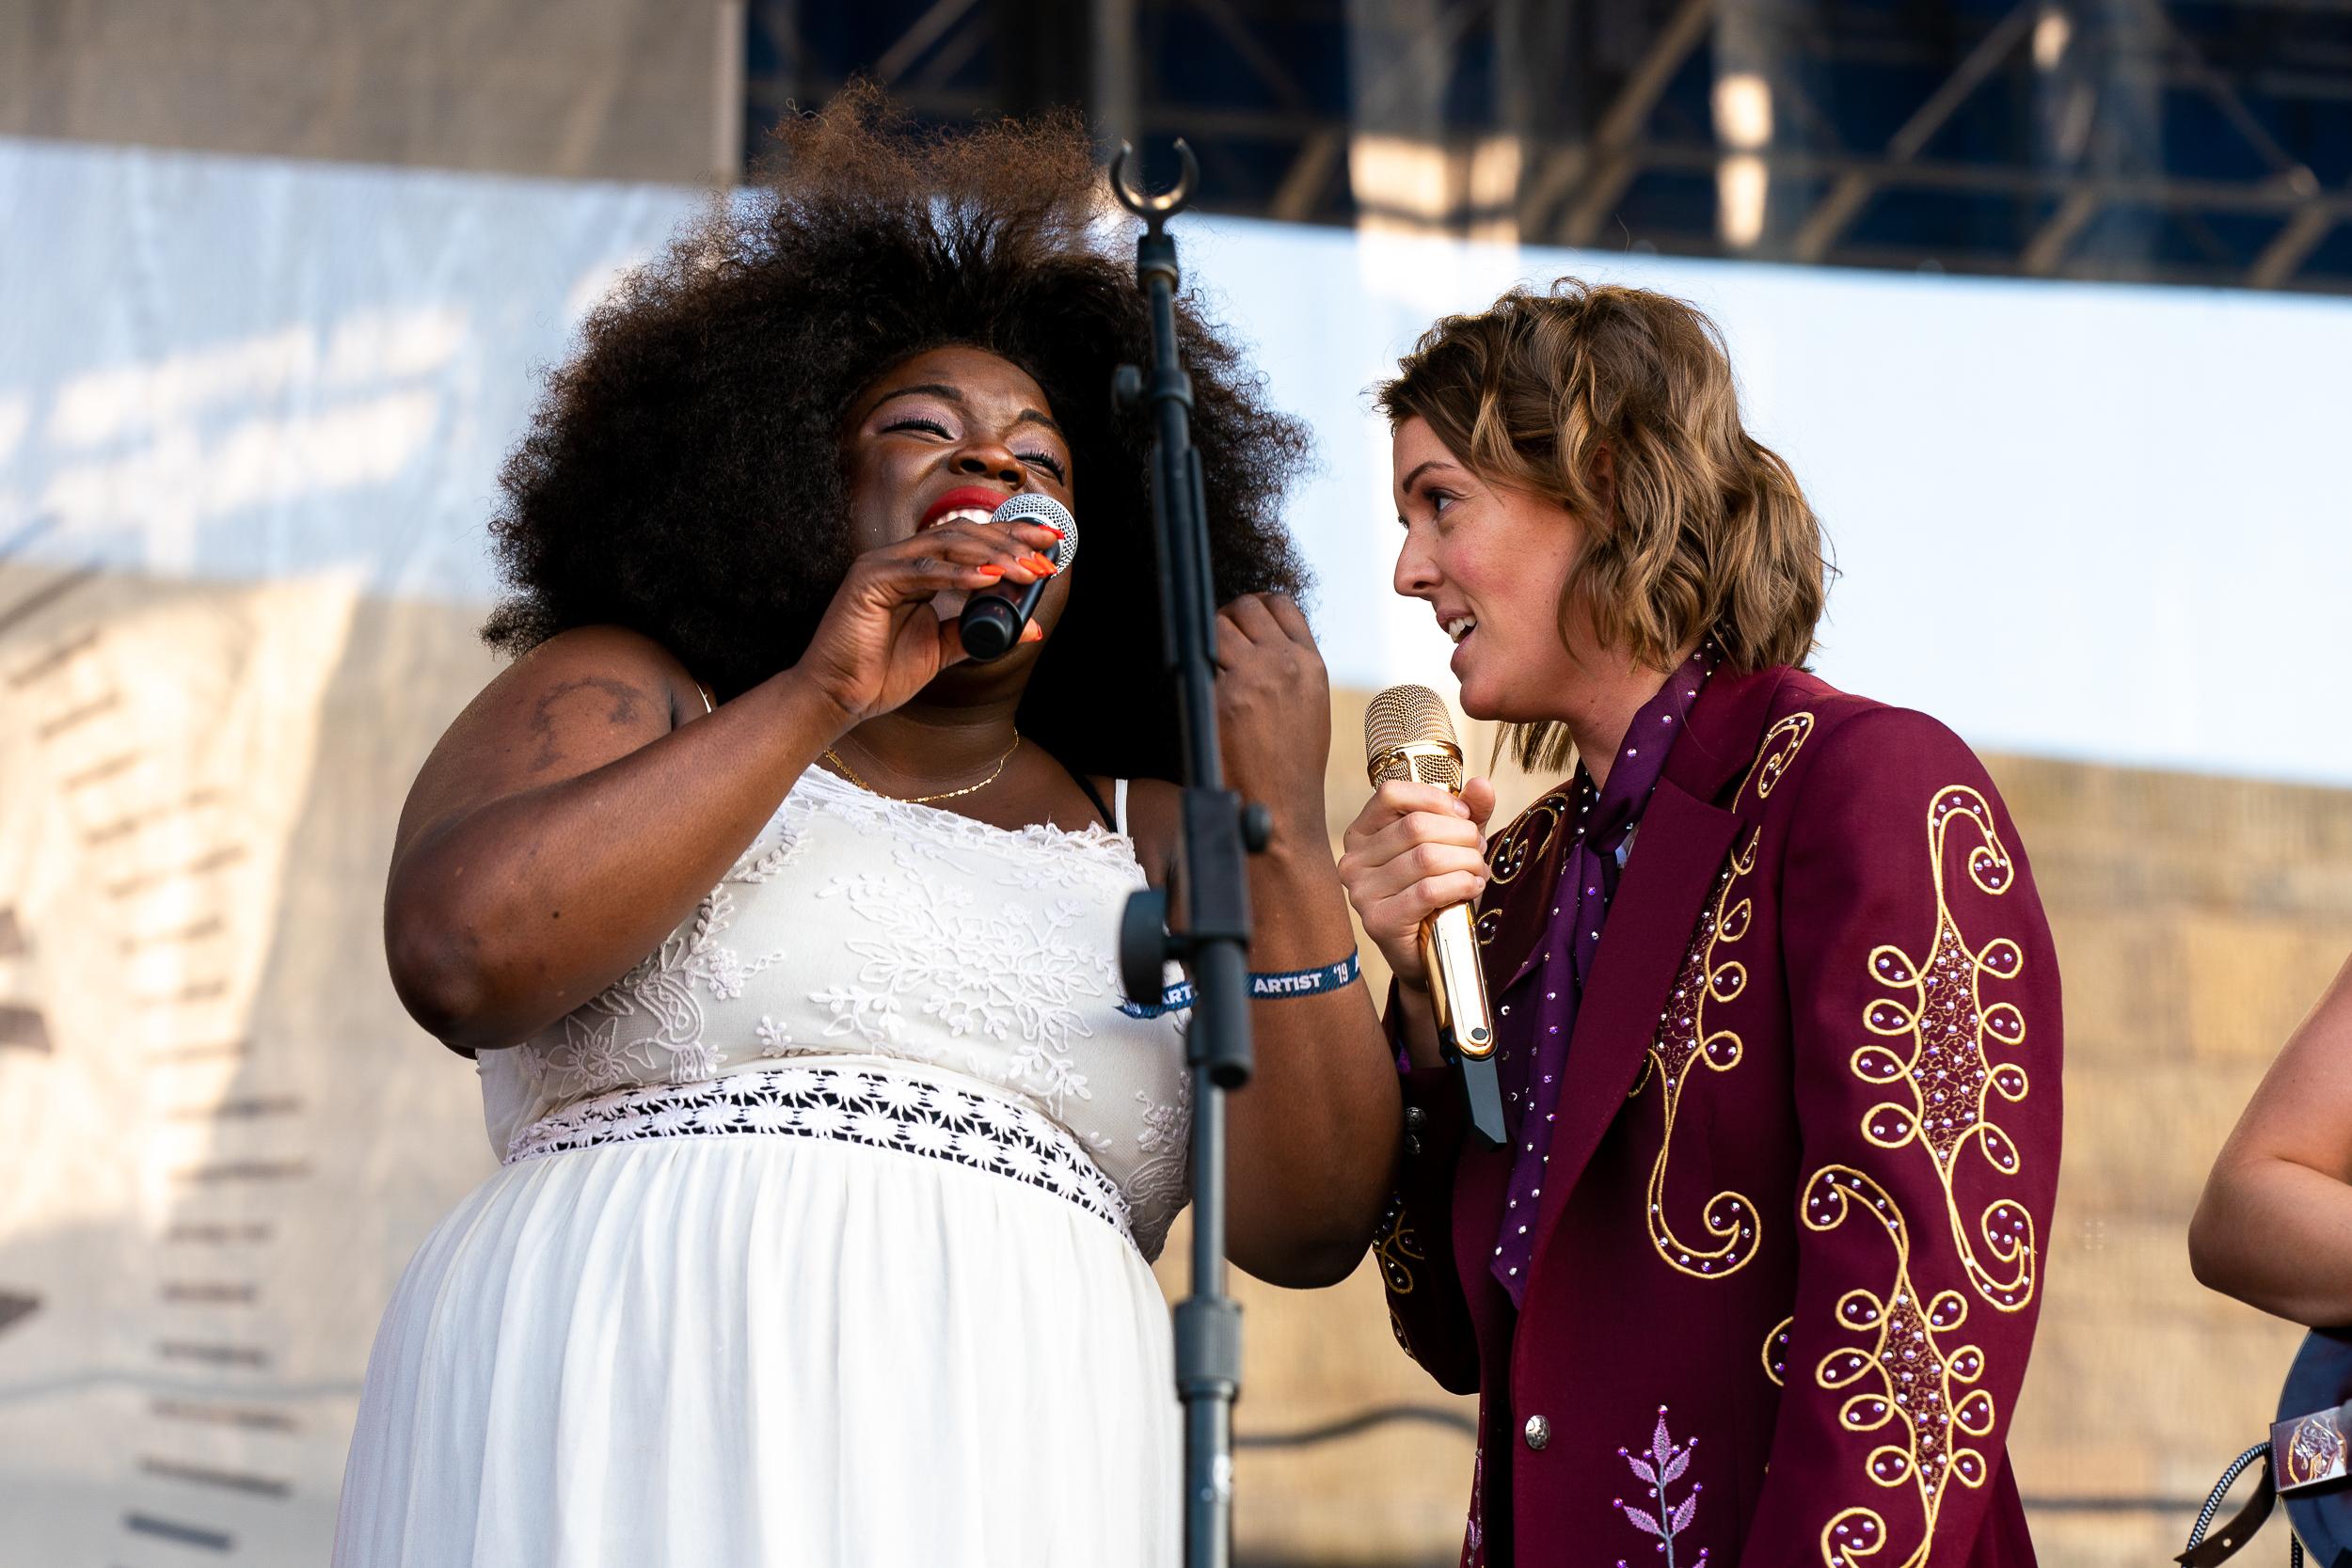 Yola and Brandi Carlile at Newport Folk Festival (Photo by Mauricio Castro)